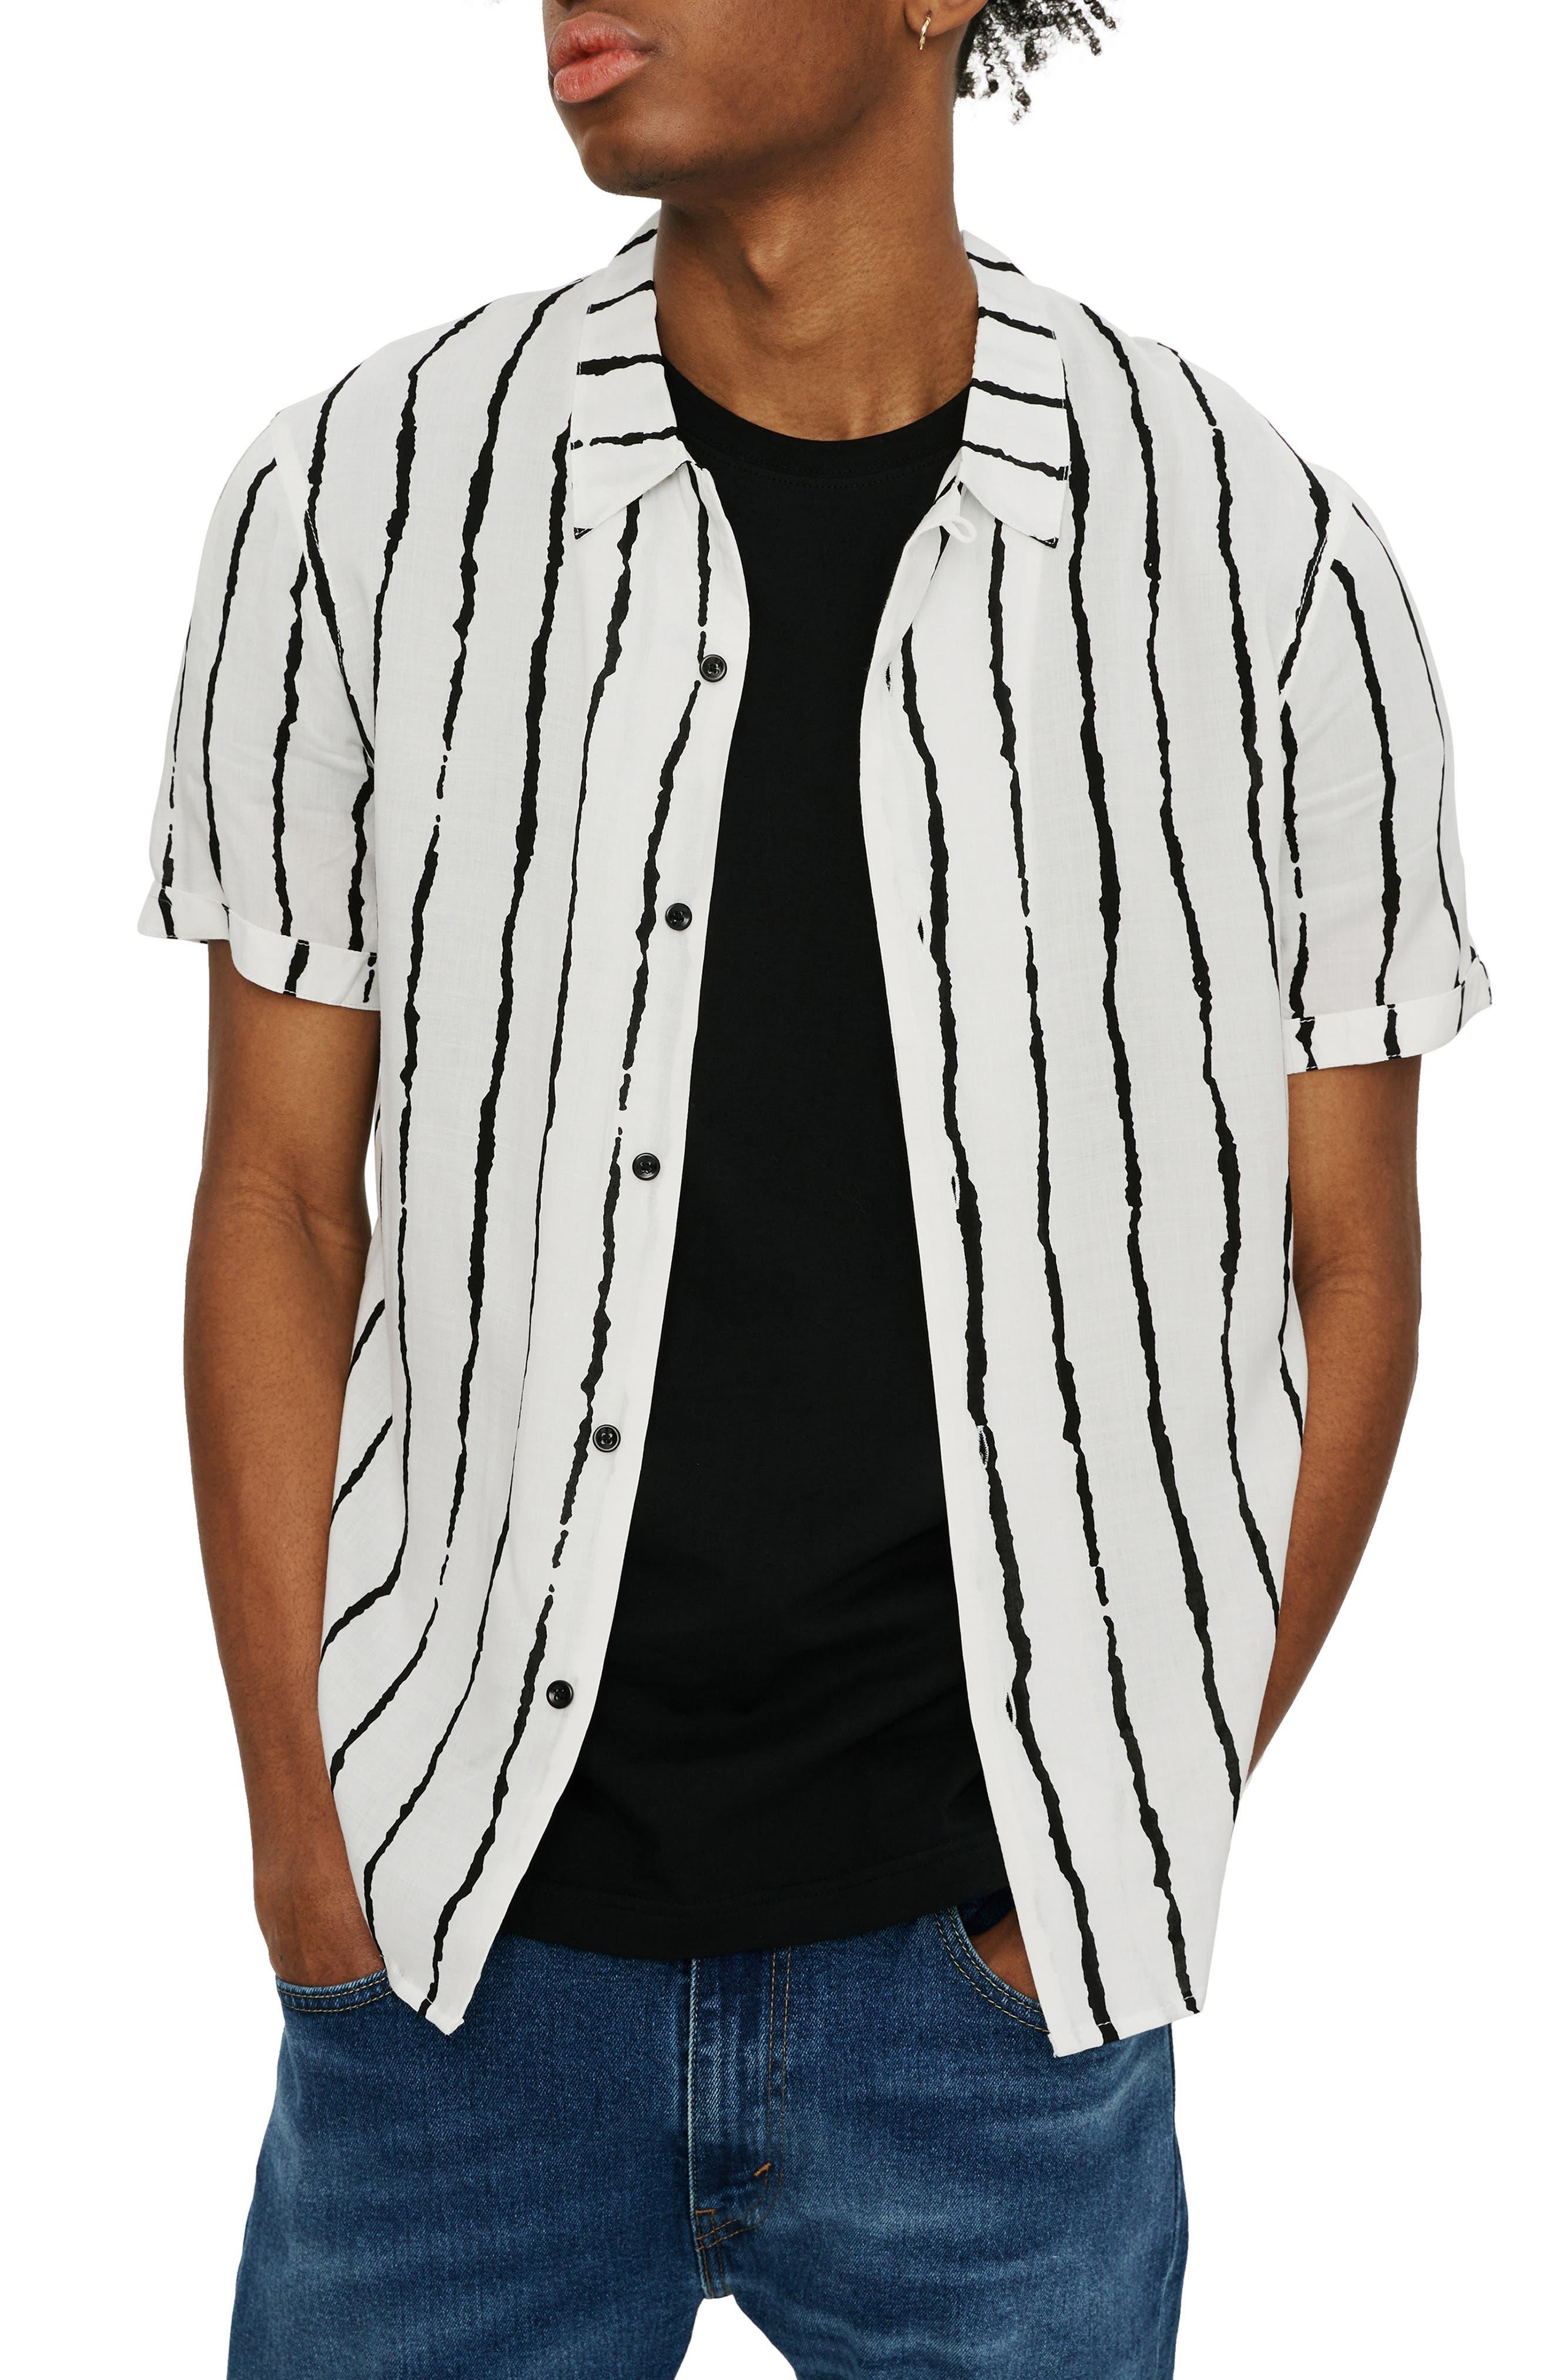 Slim Fit Stripe Short Sleeve Button-Up Shirt